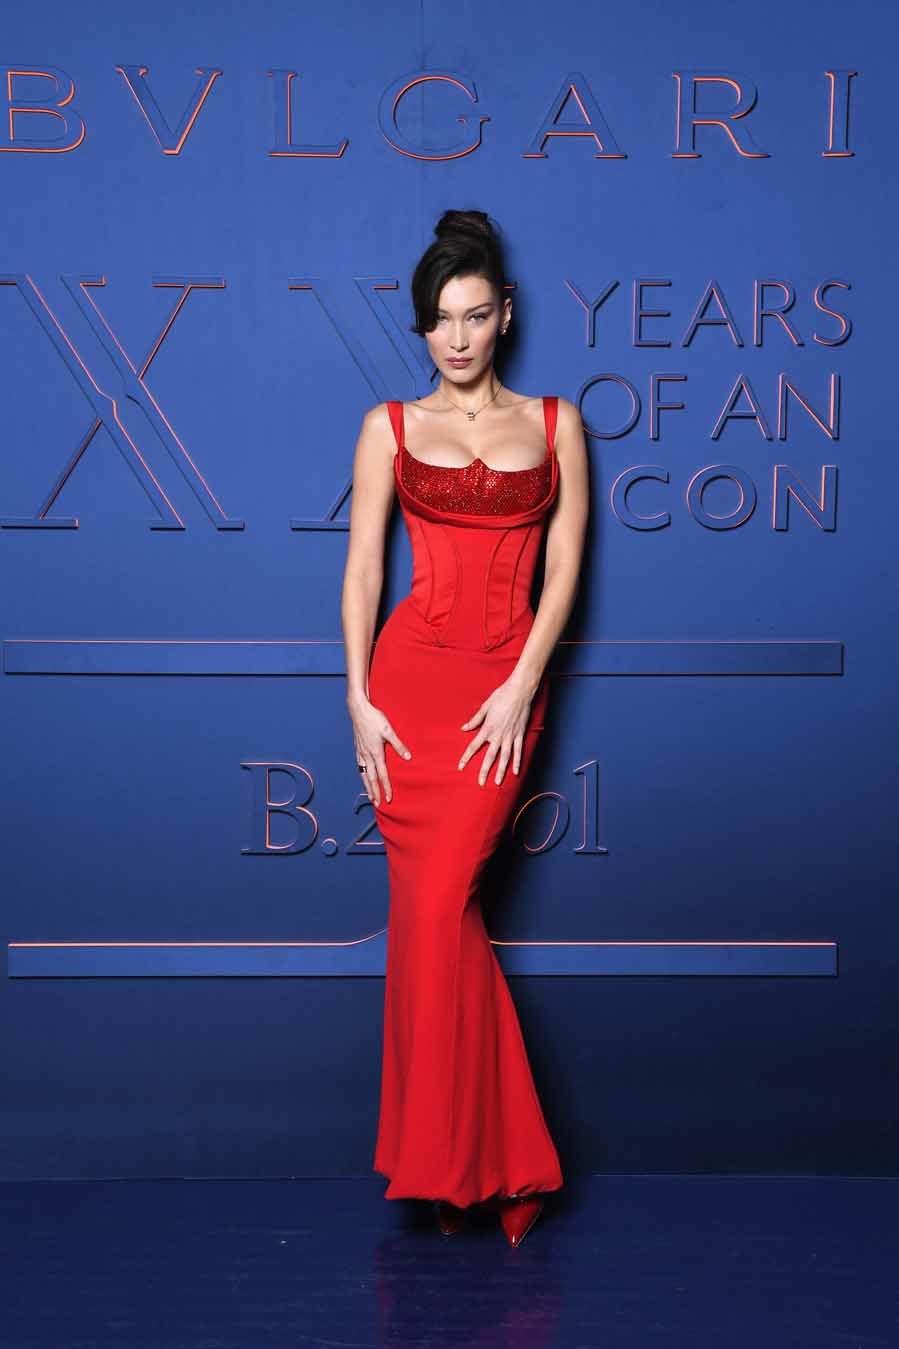 Bella Hadid - XX Aniversario de B.zero1 de Bvlgari